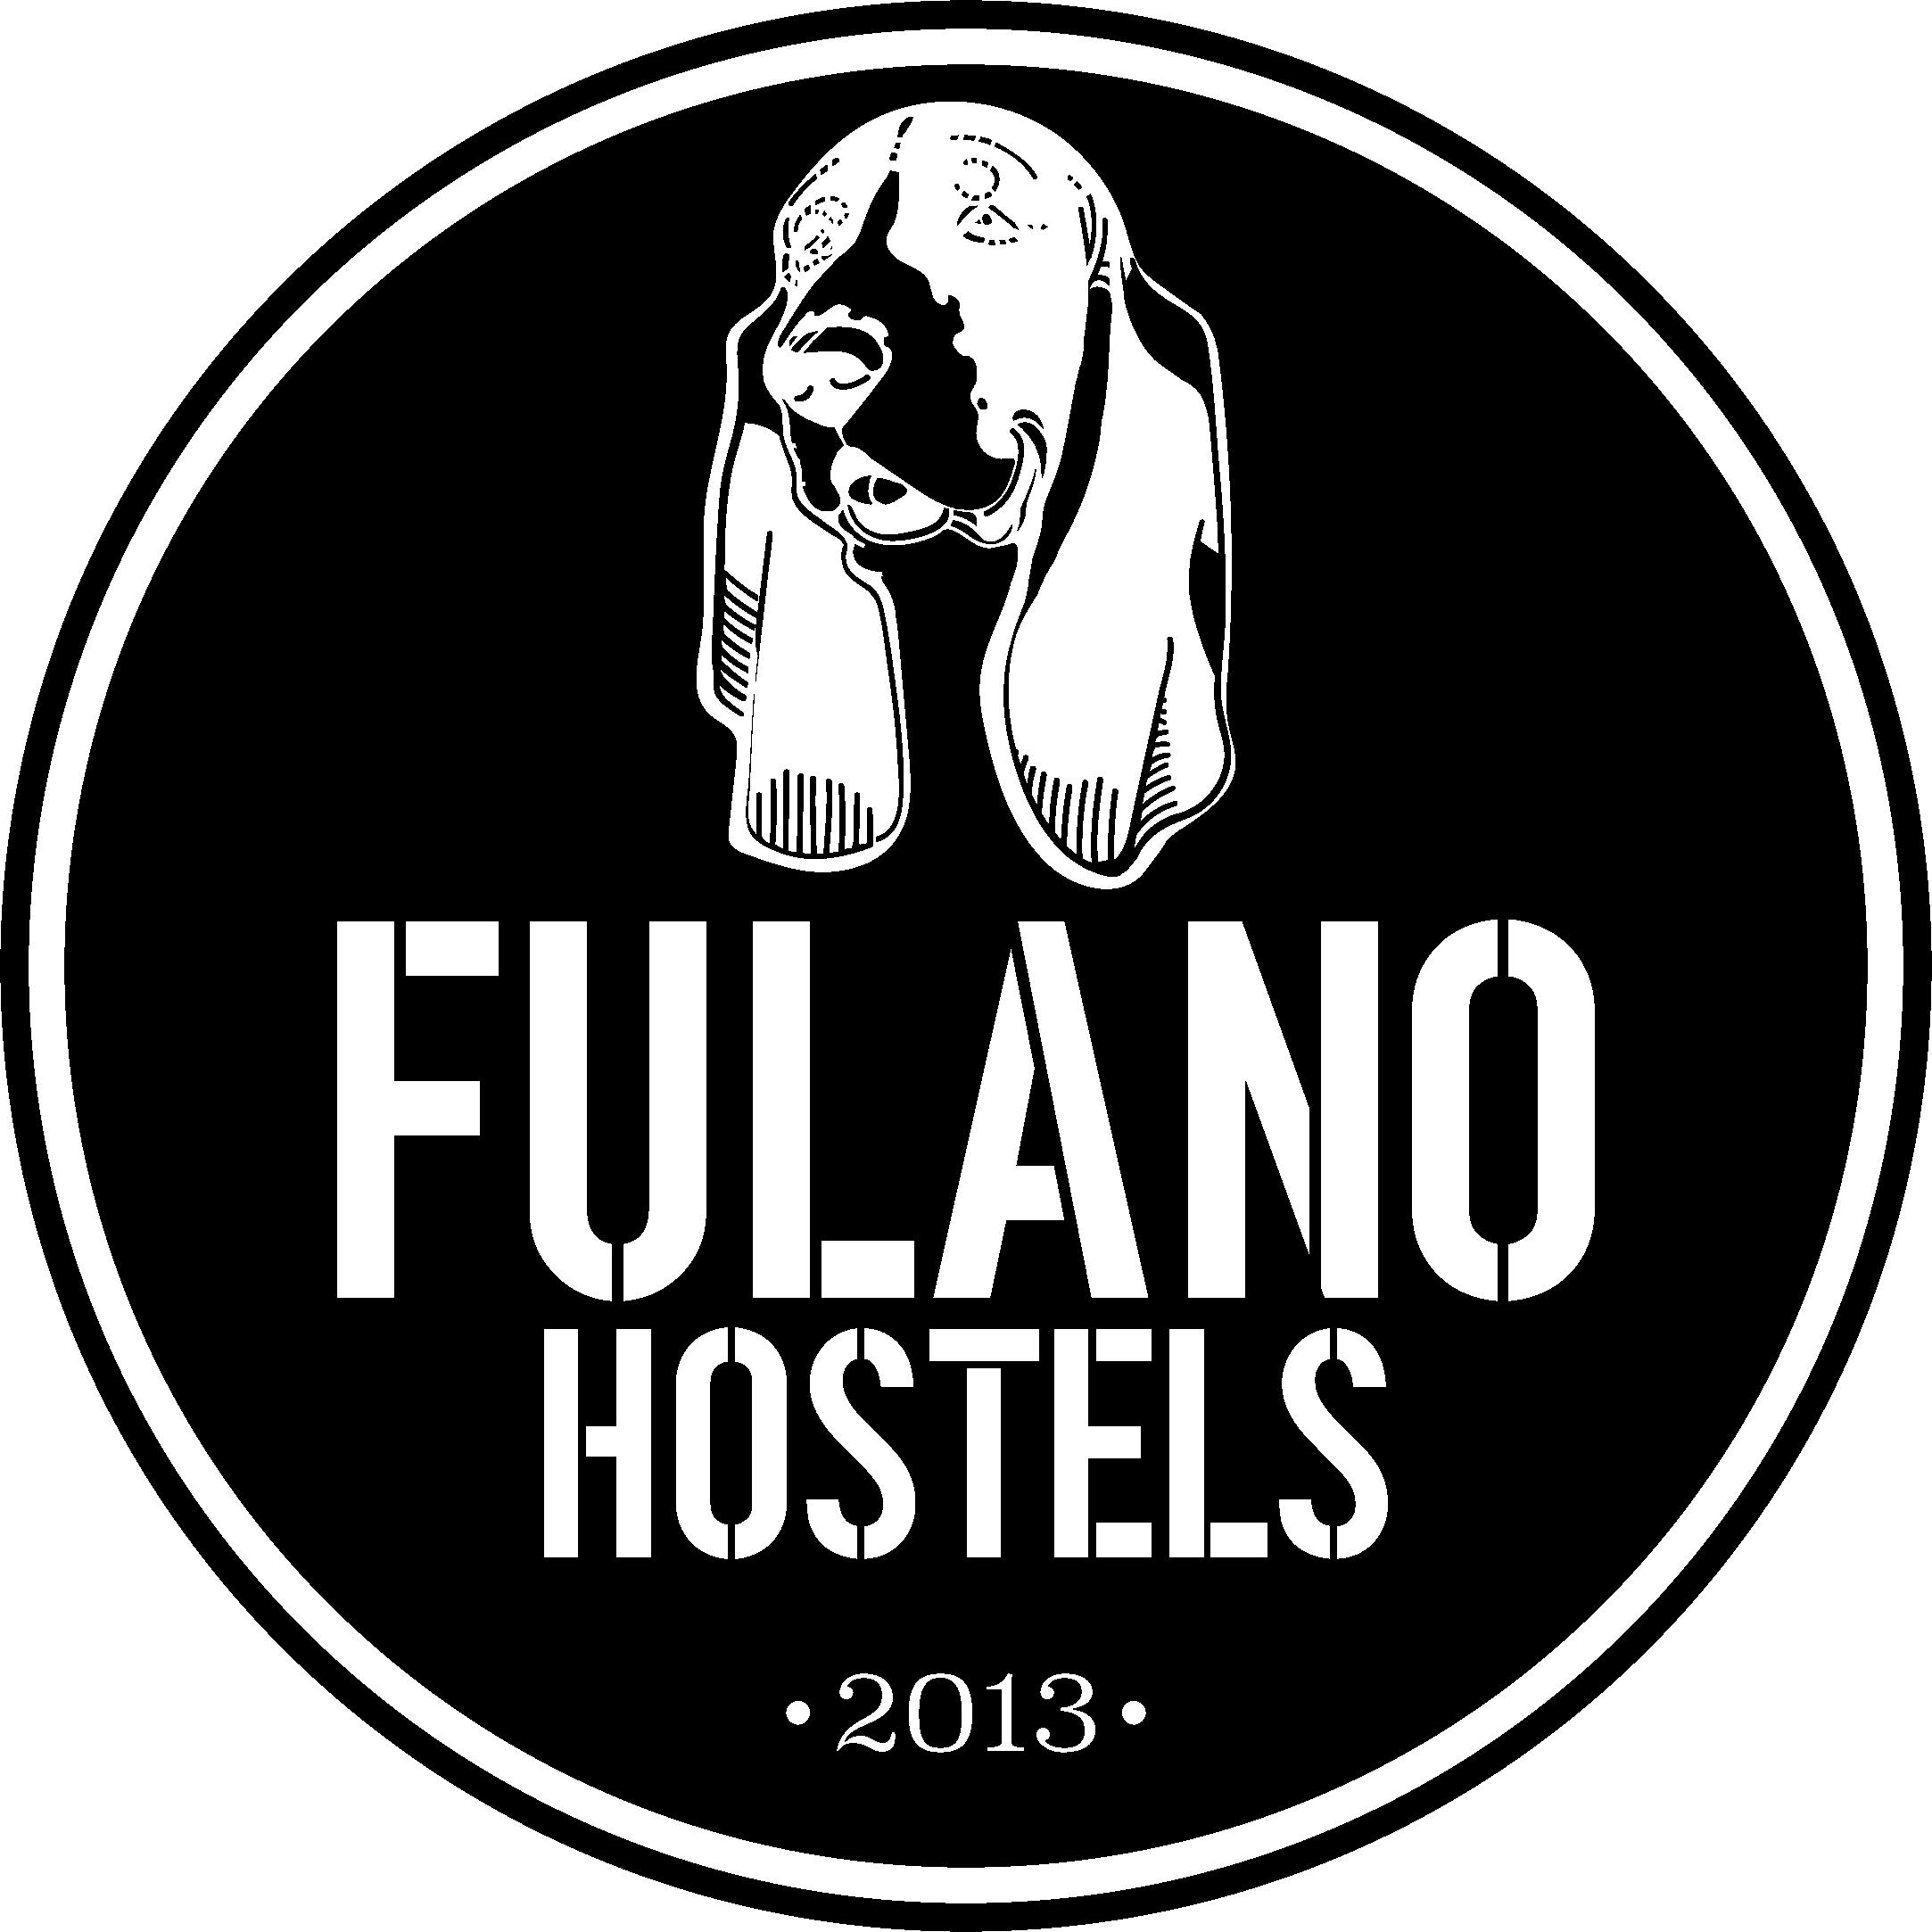 Fulano Hostels Negro.png